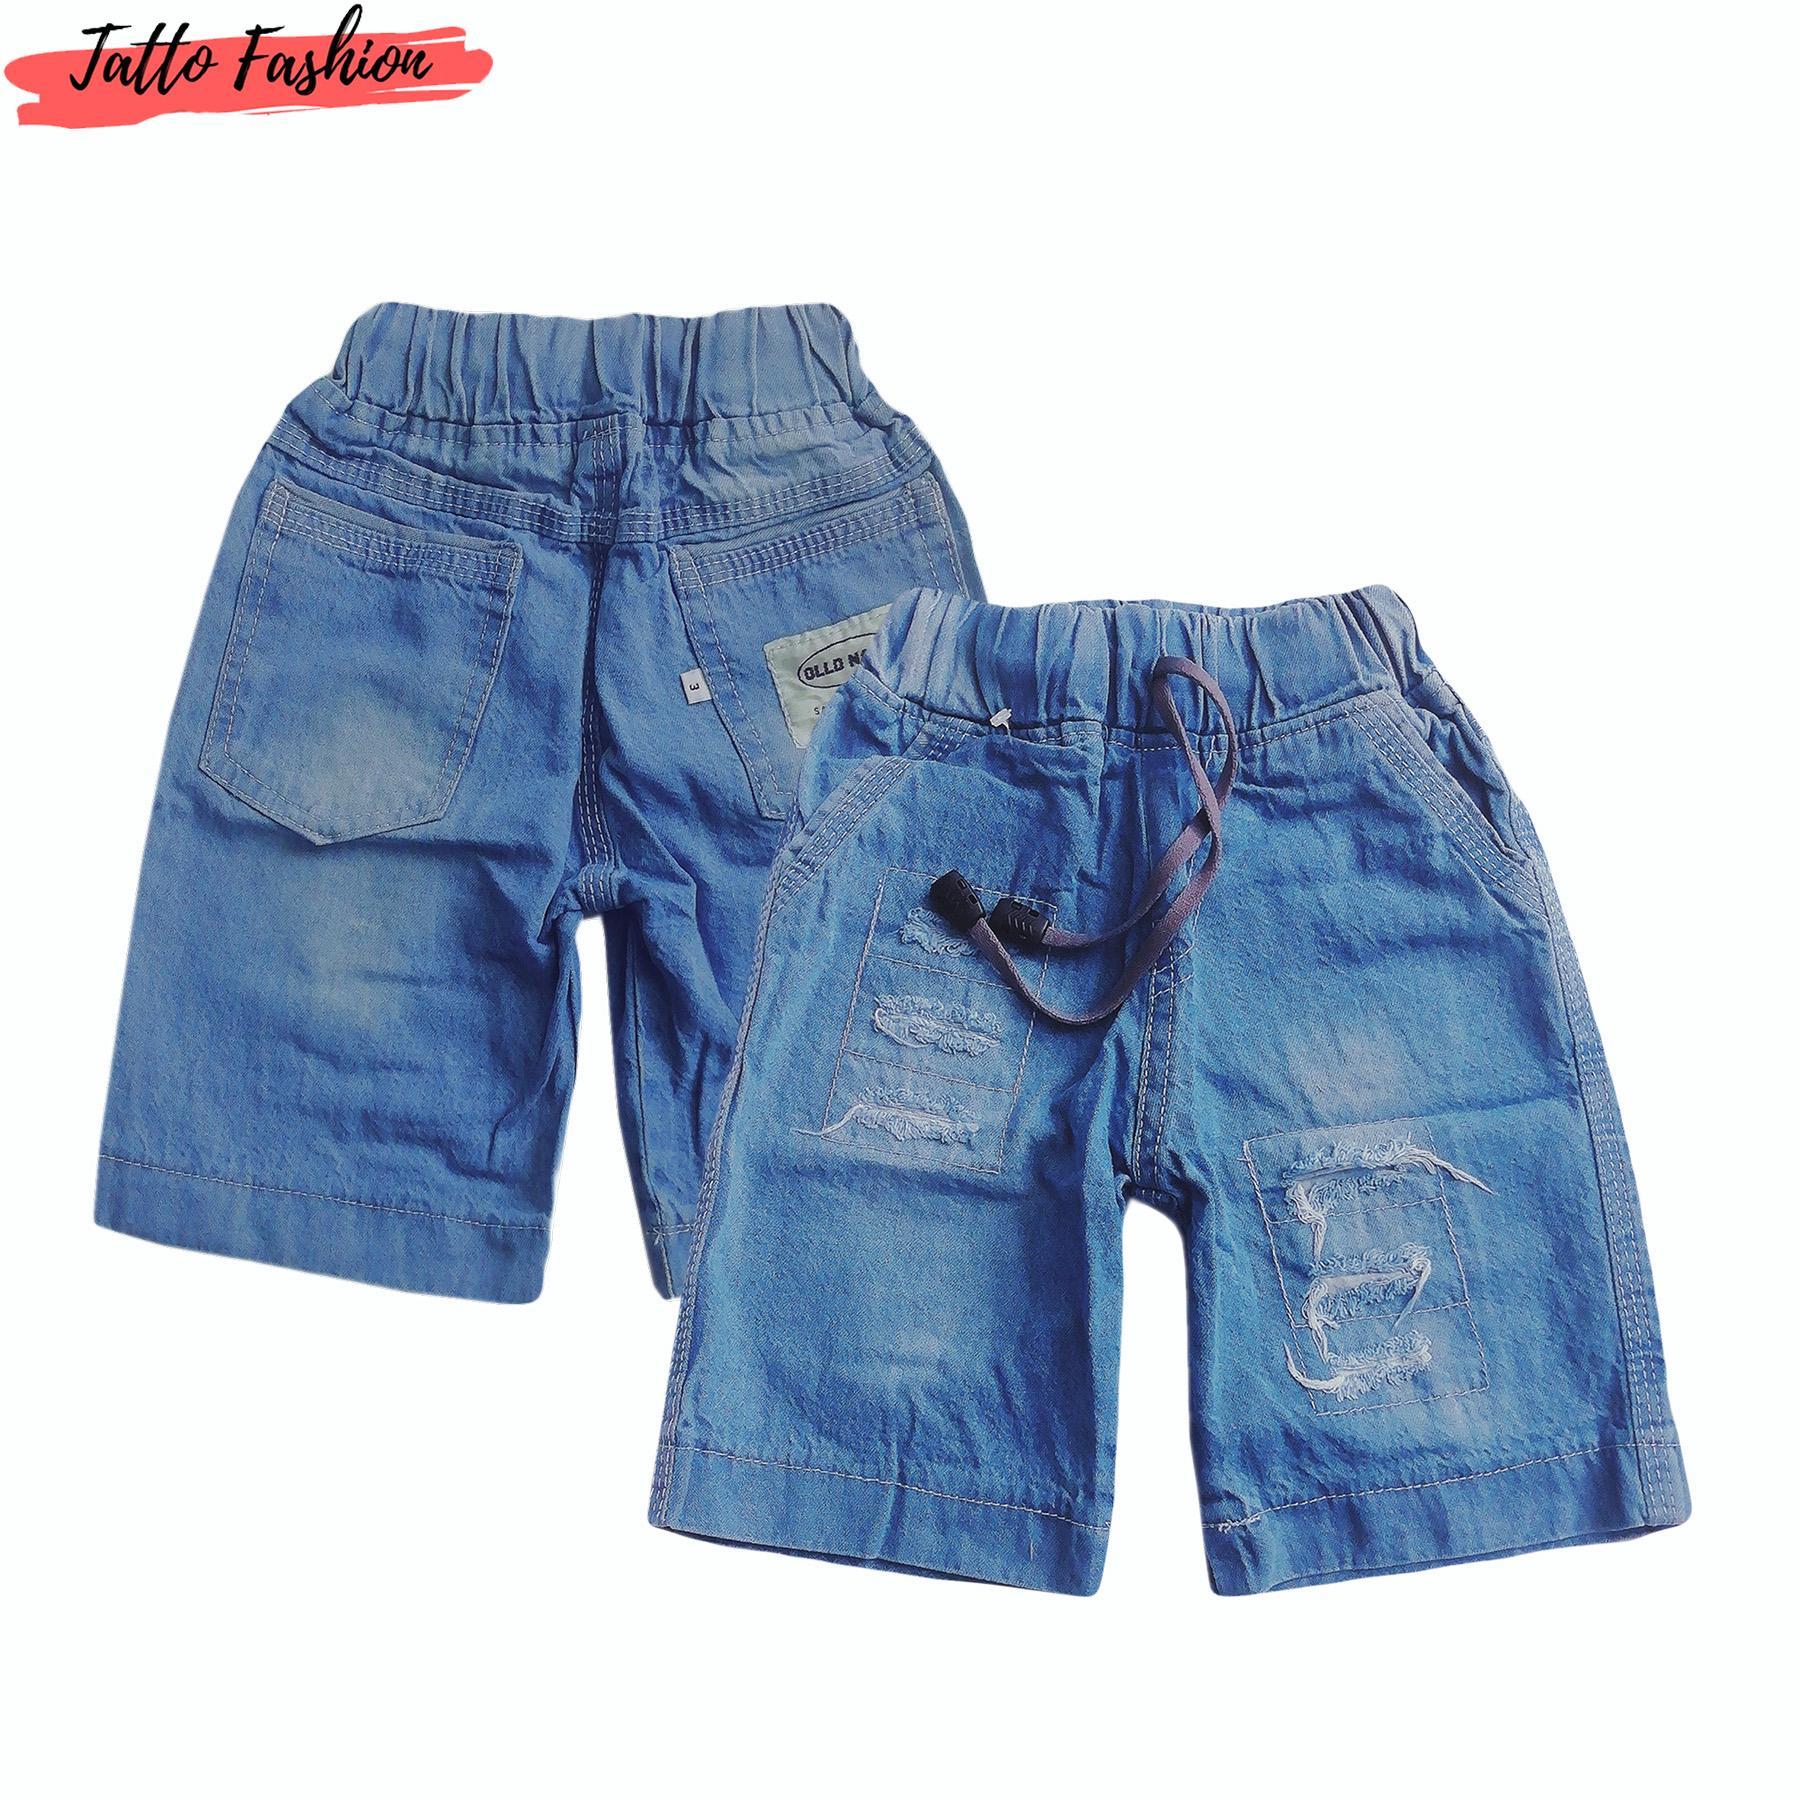 Celana Short Jeans Ripped Untuk Anak